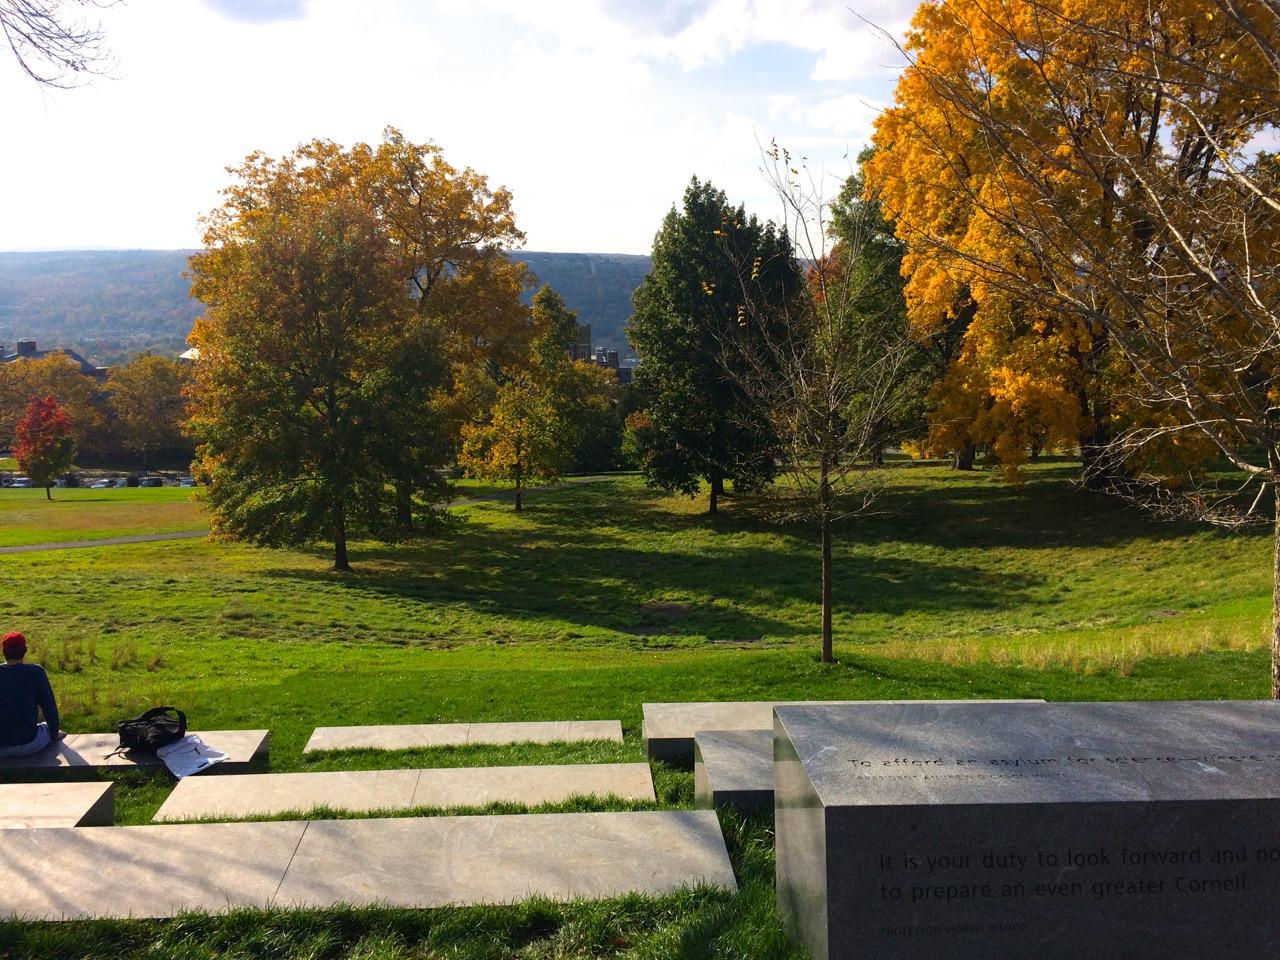 Sesquicentennial-Grove-Cornell-10-17-1404